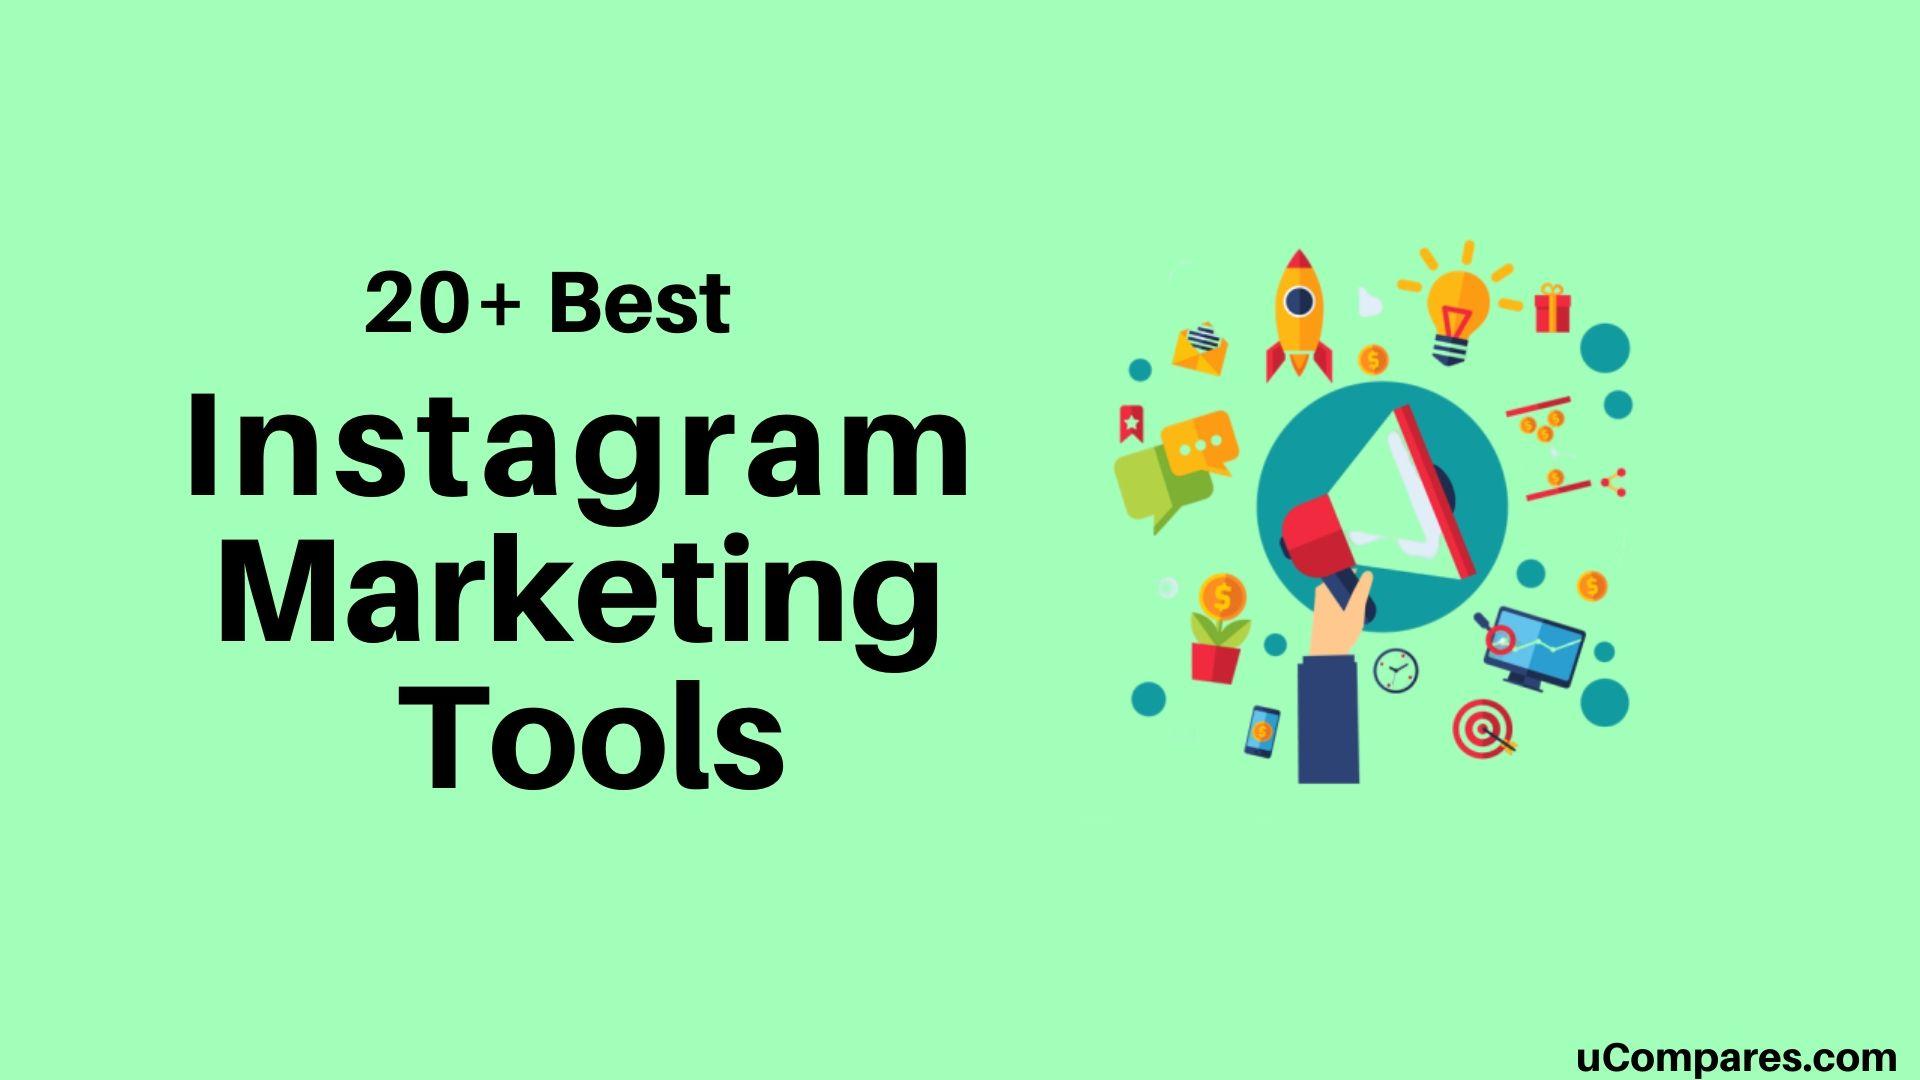 Instagram Marketing Tools